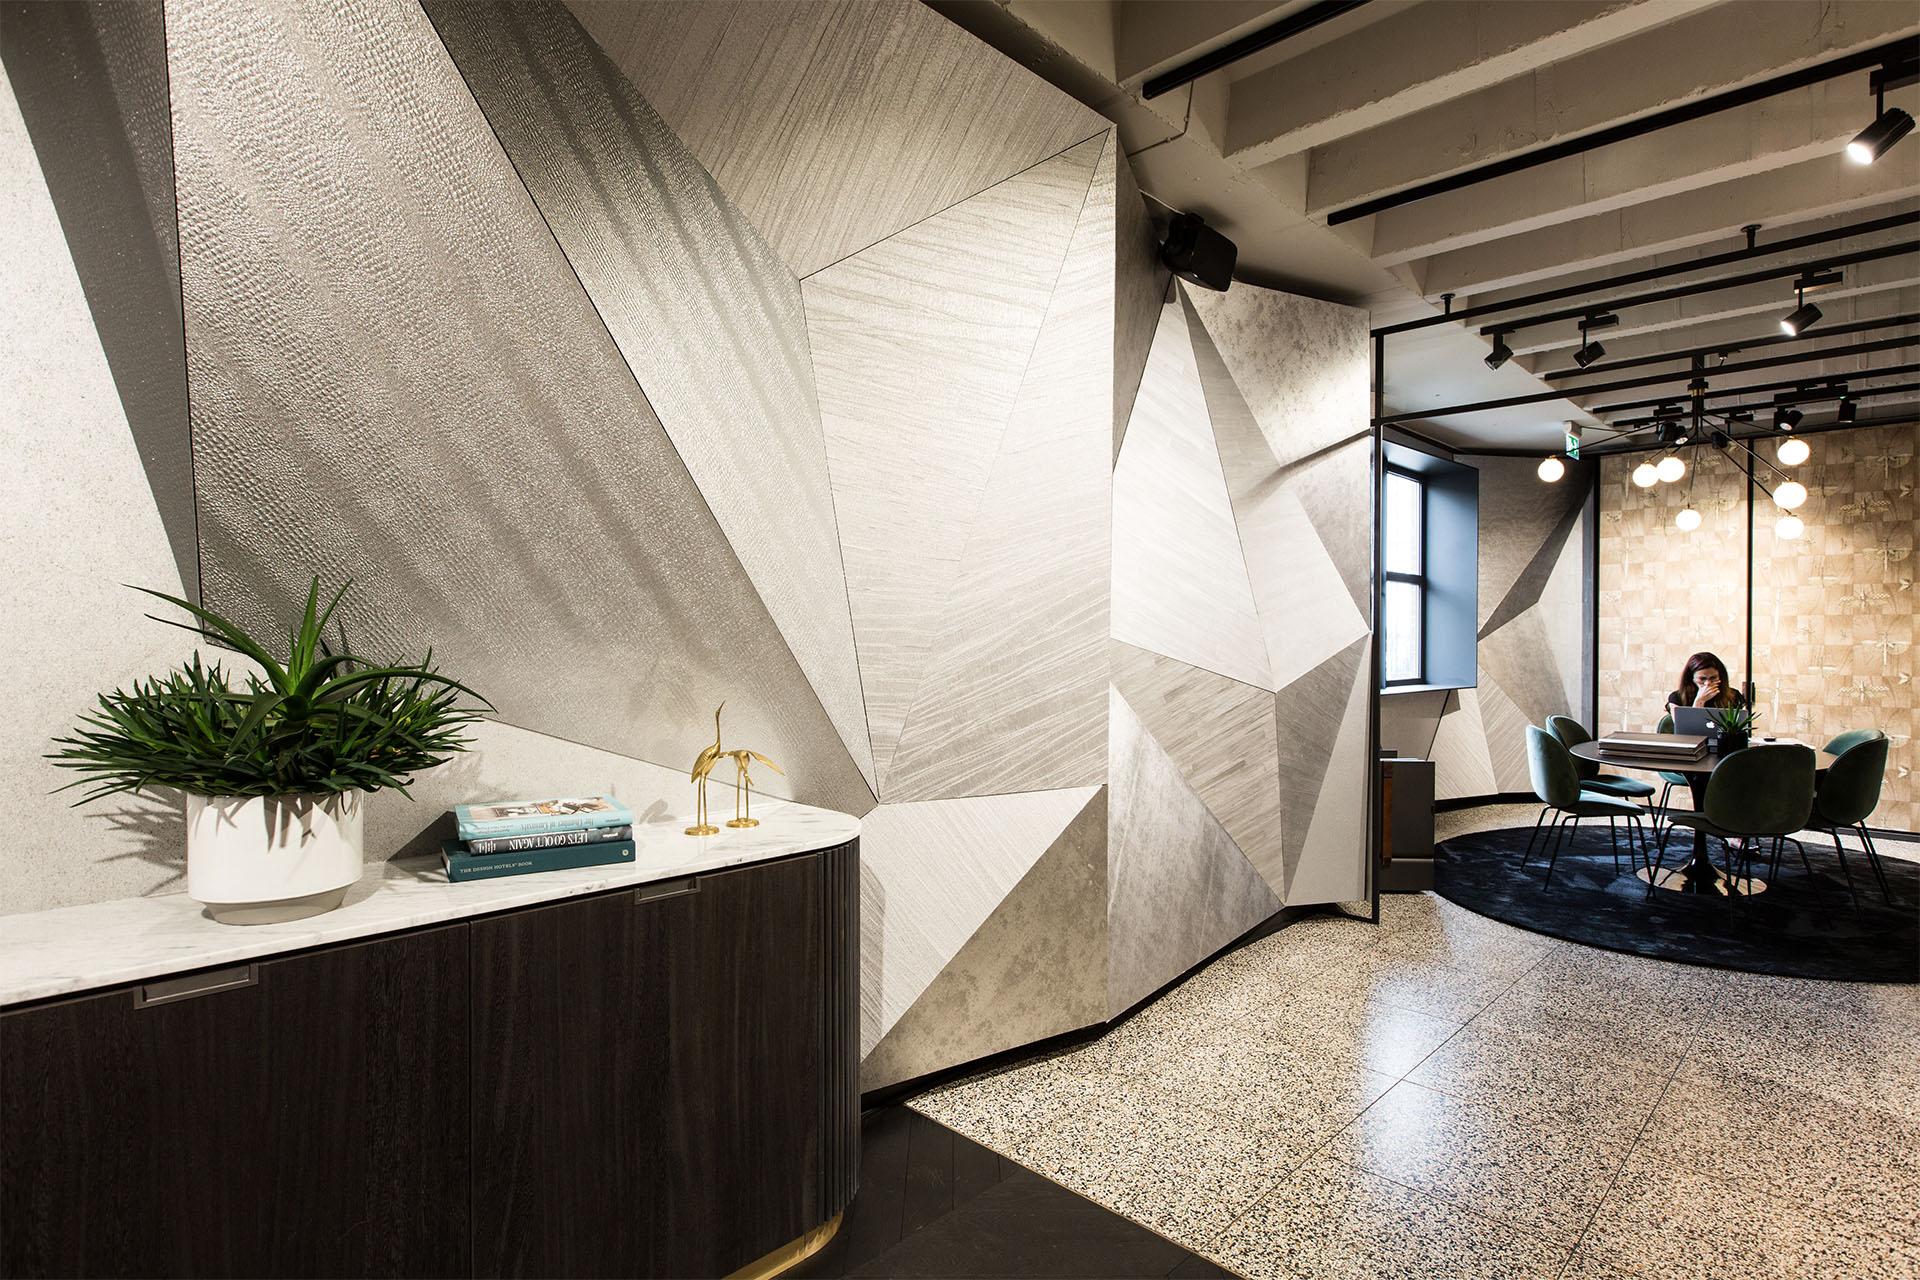 Creneau Interior Design Agency Dubai Middle East Arte Interior Meeting Space